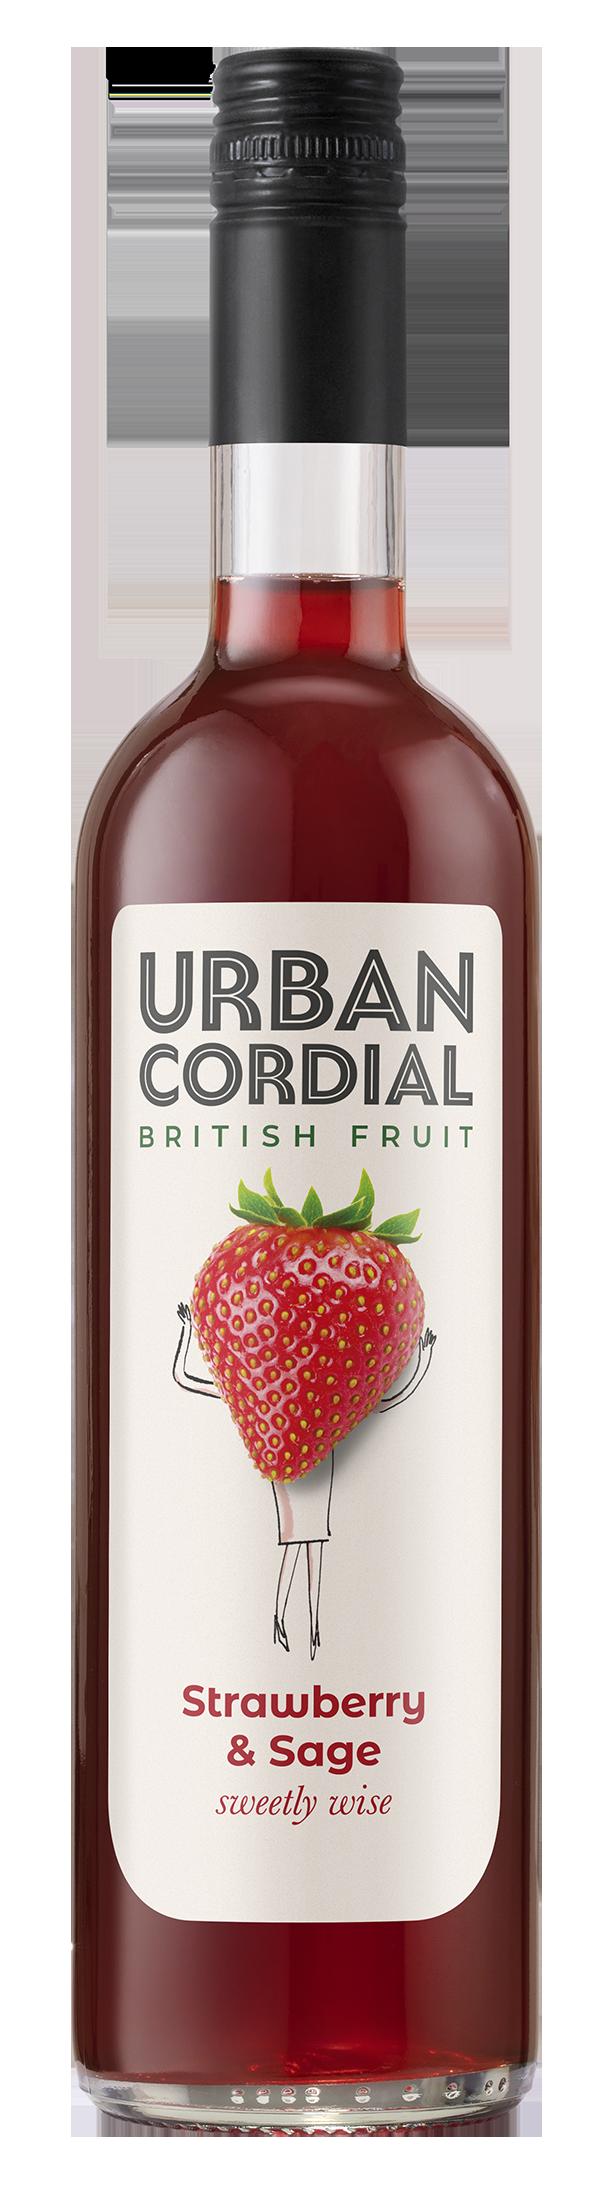 Strawberry & Sage Cordial by Urban Cordials 500ml